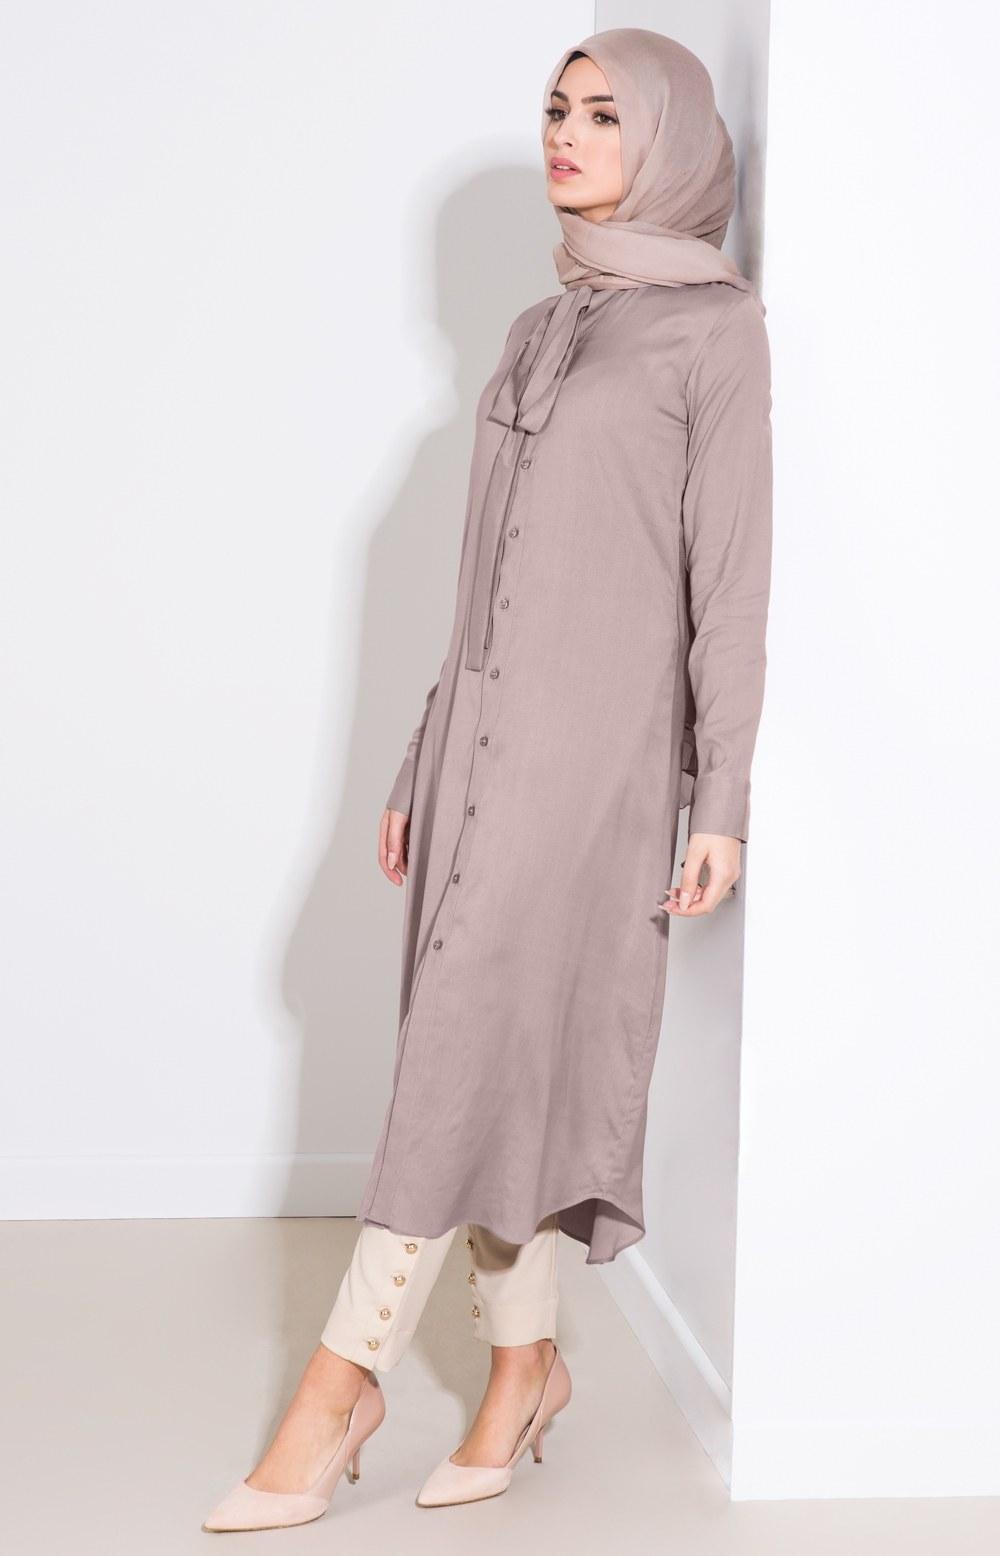 Model Baju Lebaran Simple 9ddf 25 Trend Model Baju Muslim Lebaran 2018 Simple & Modis